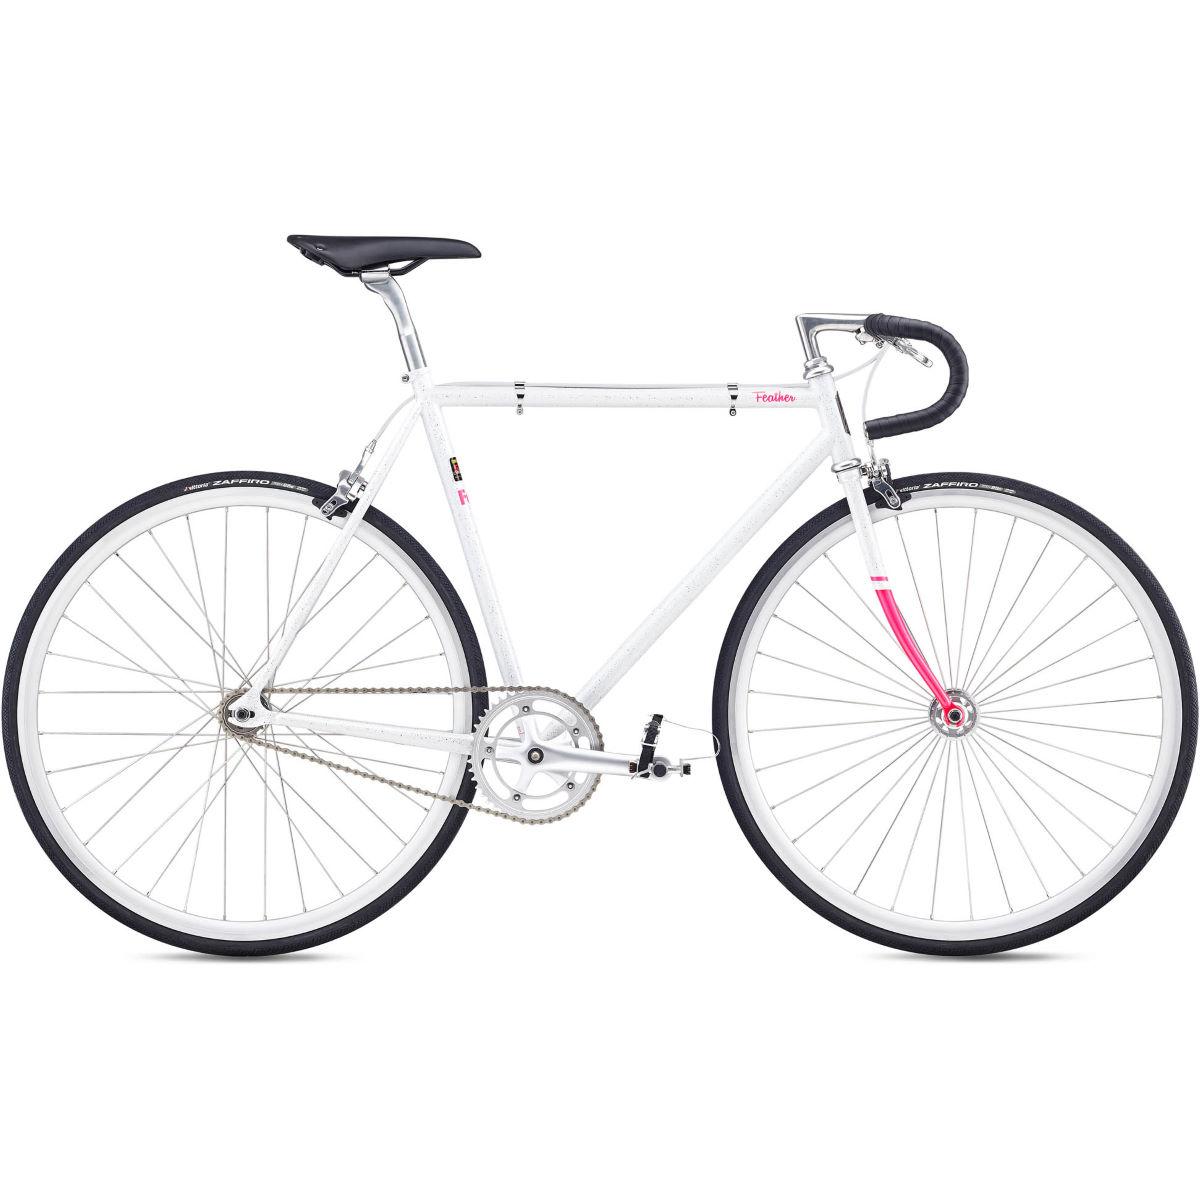 Fuji Feather 2020 Gold Flake Bikes